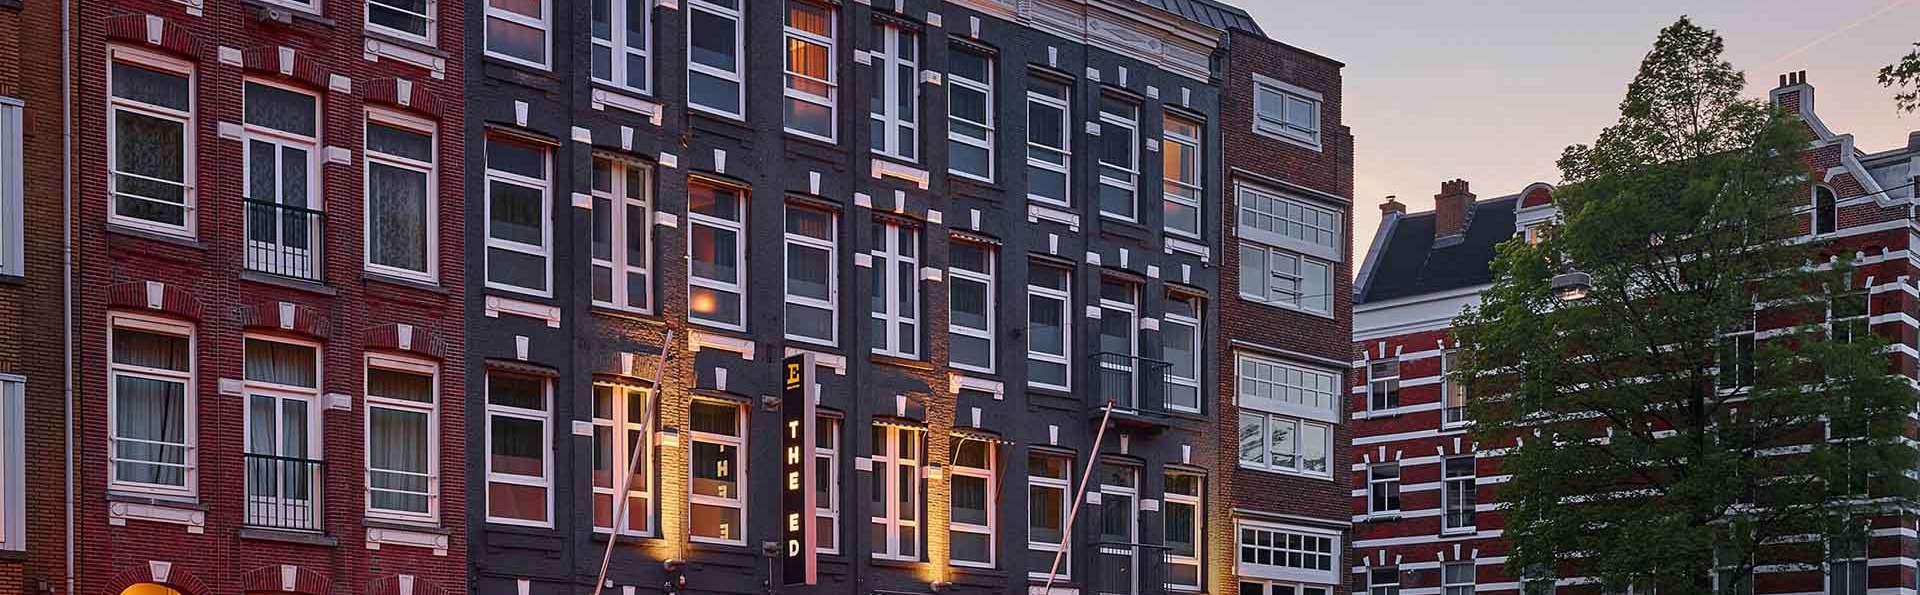 The ED Amsterdam - EDIT_EH_-_THE_ED_HOTEL_AMSTERDAM_-_EXTERIEUR_02.jpg